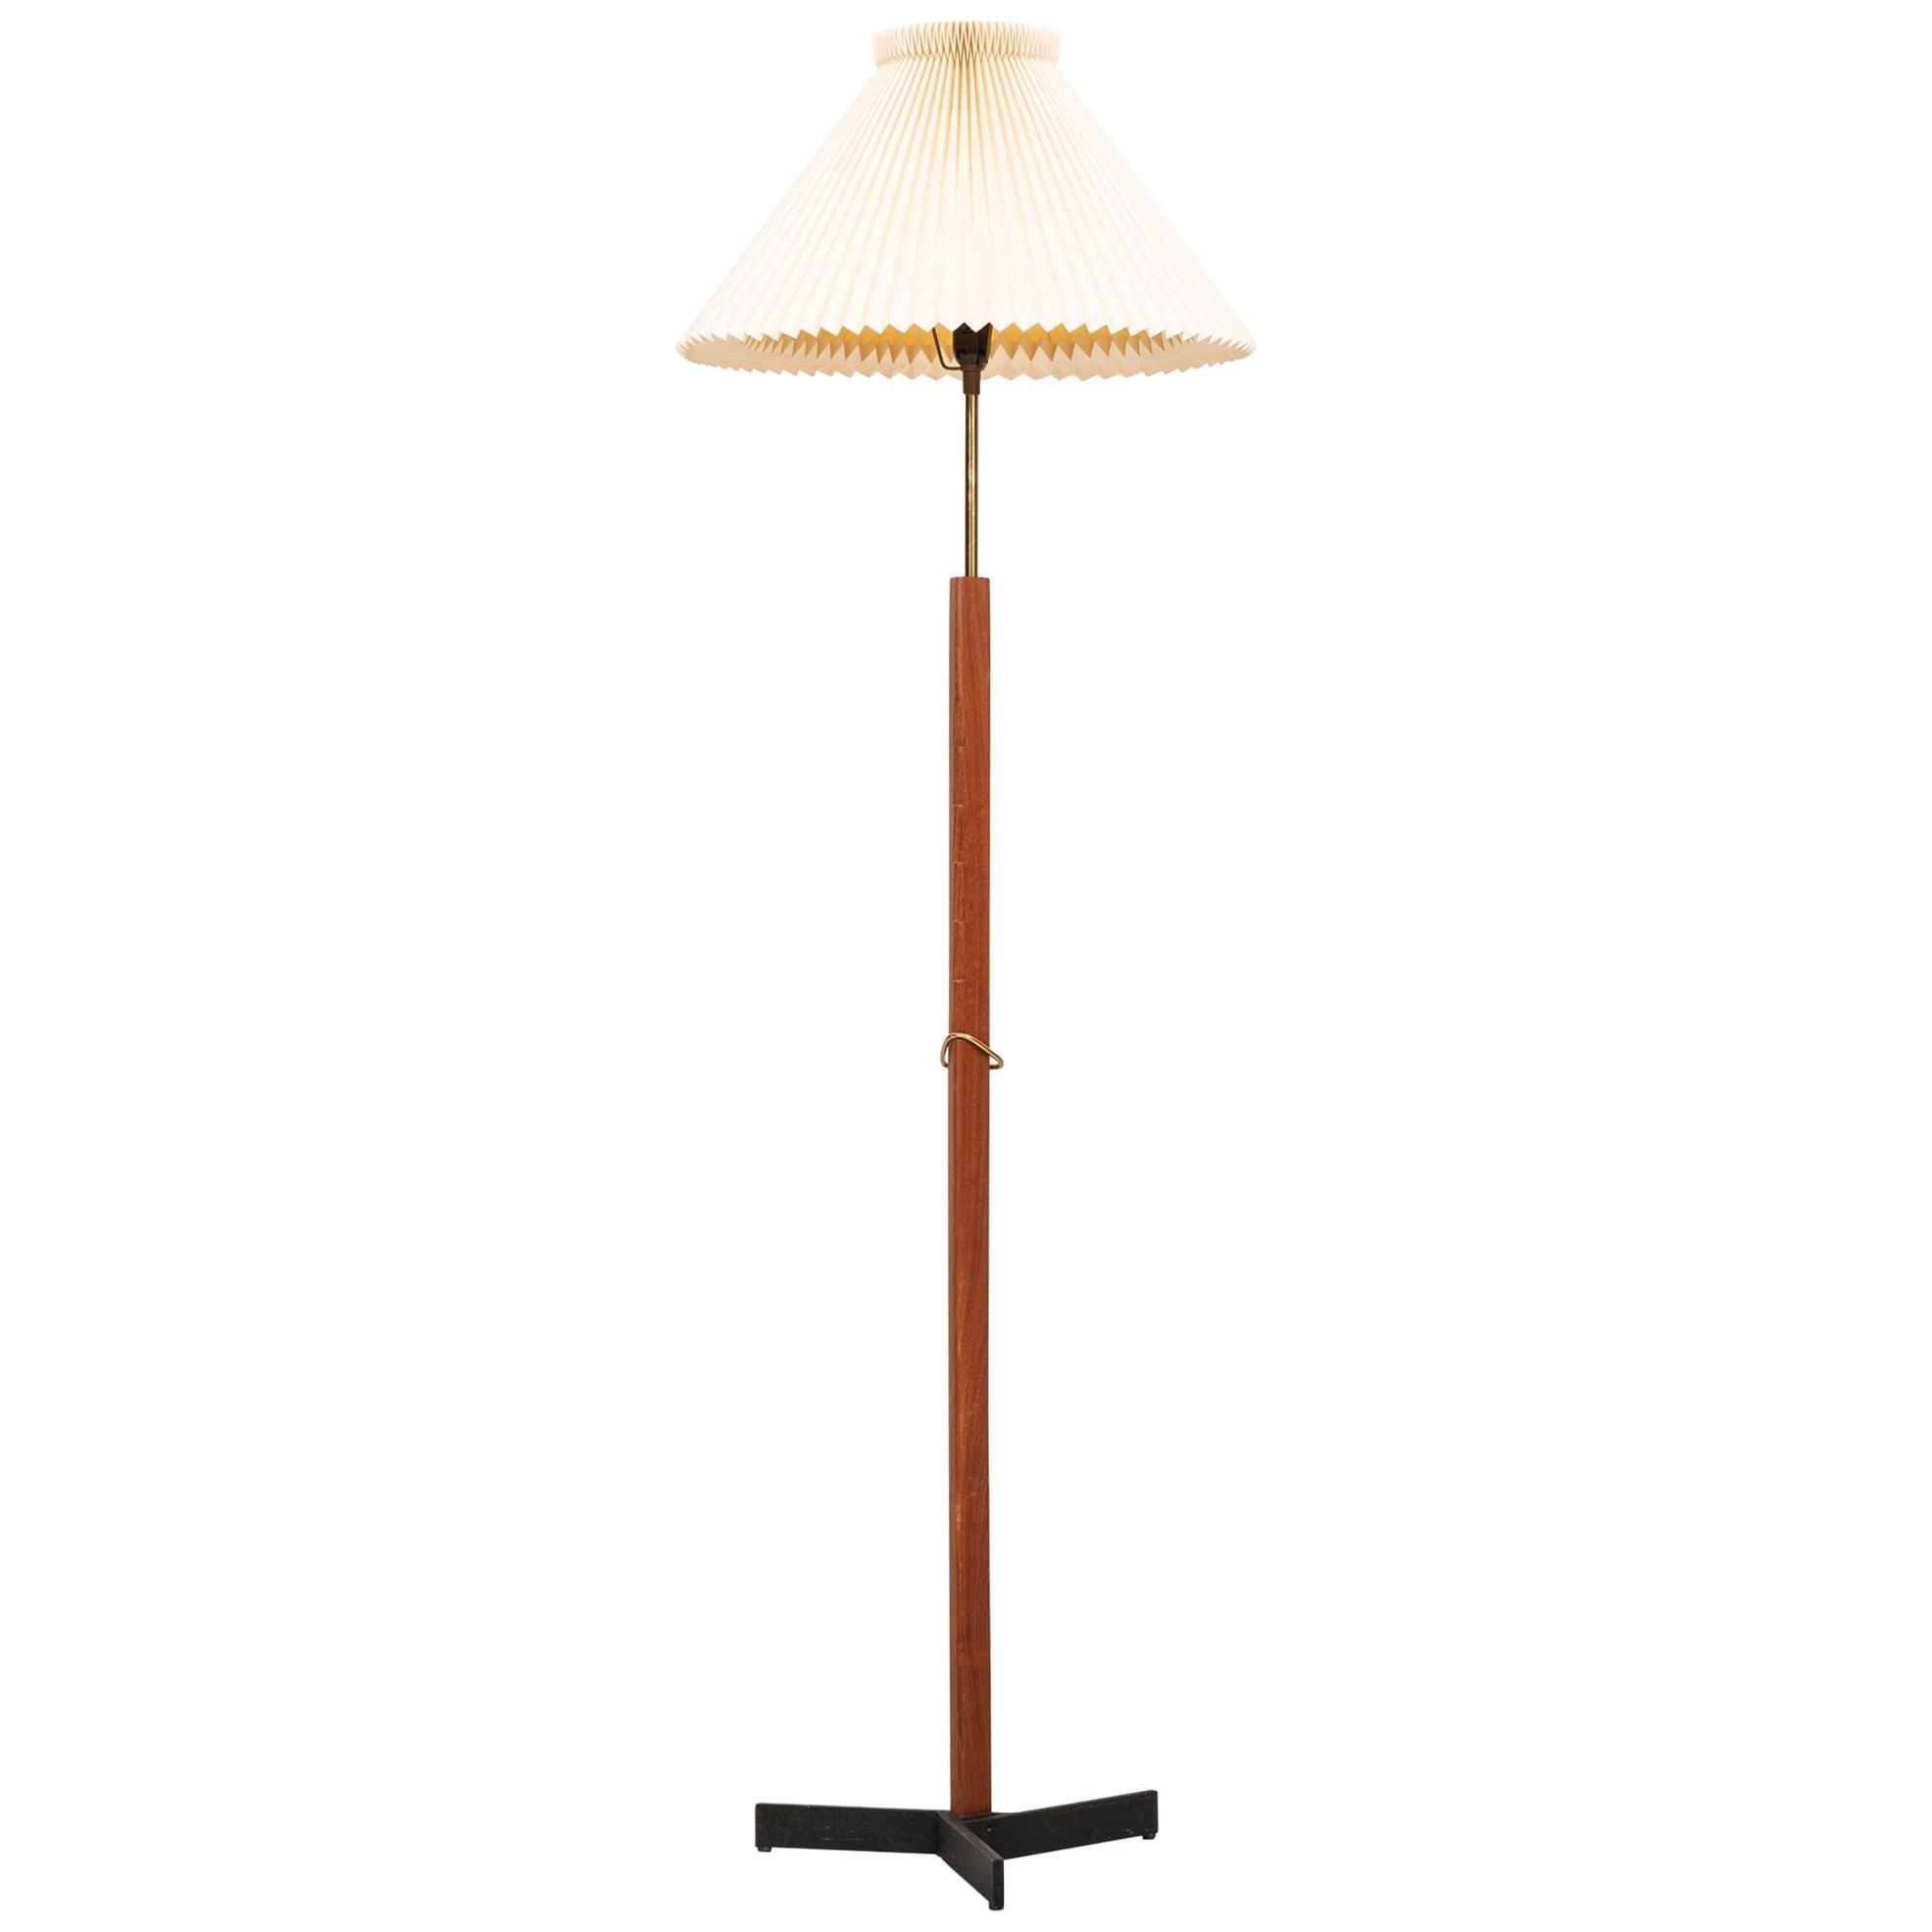 Svend Aage Holm Sørensen Floor Lamp Produced by Holm Sørensen & Co in Denmark